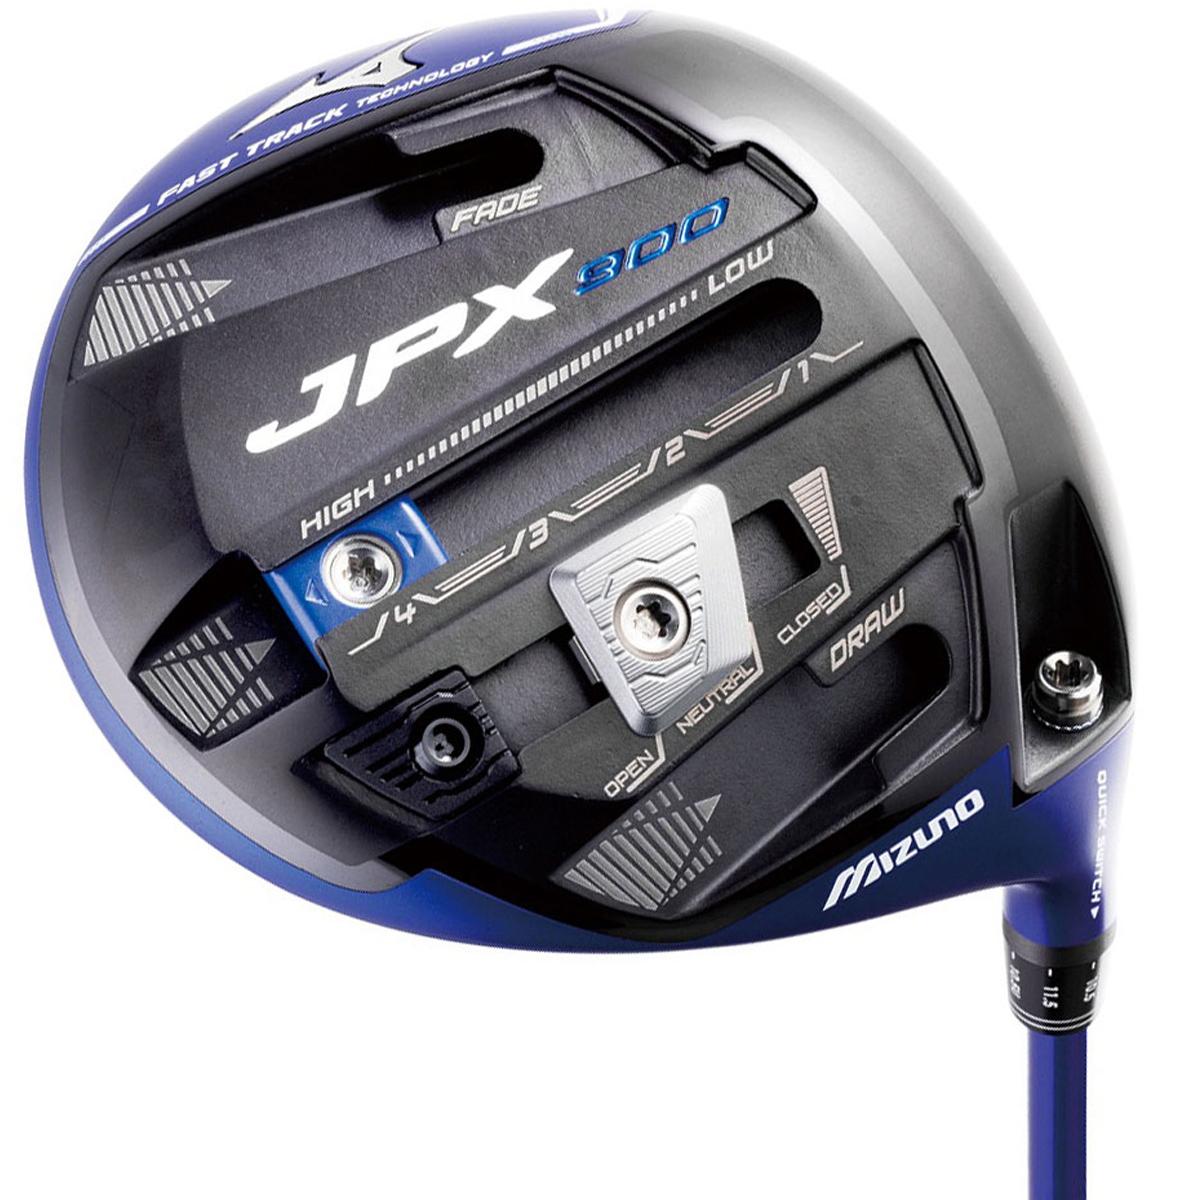 JPX900 ドライバー Orochi BLUE EYE D